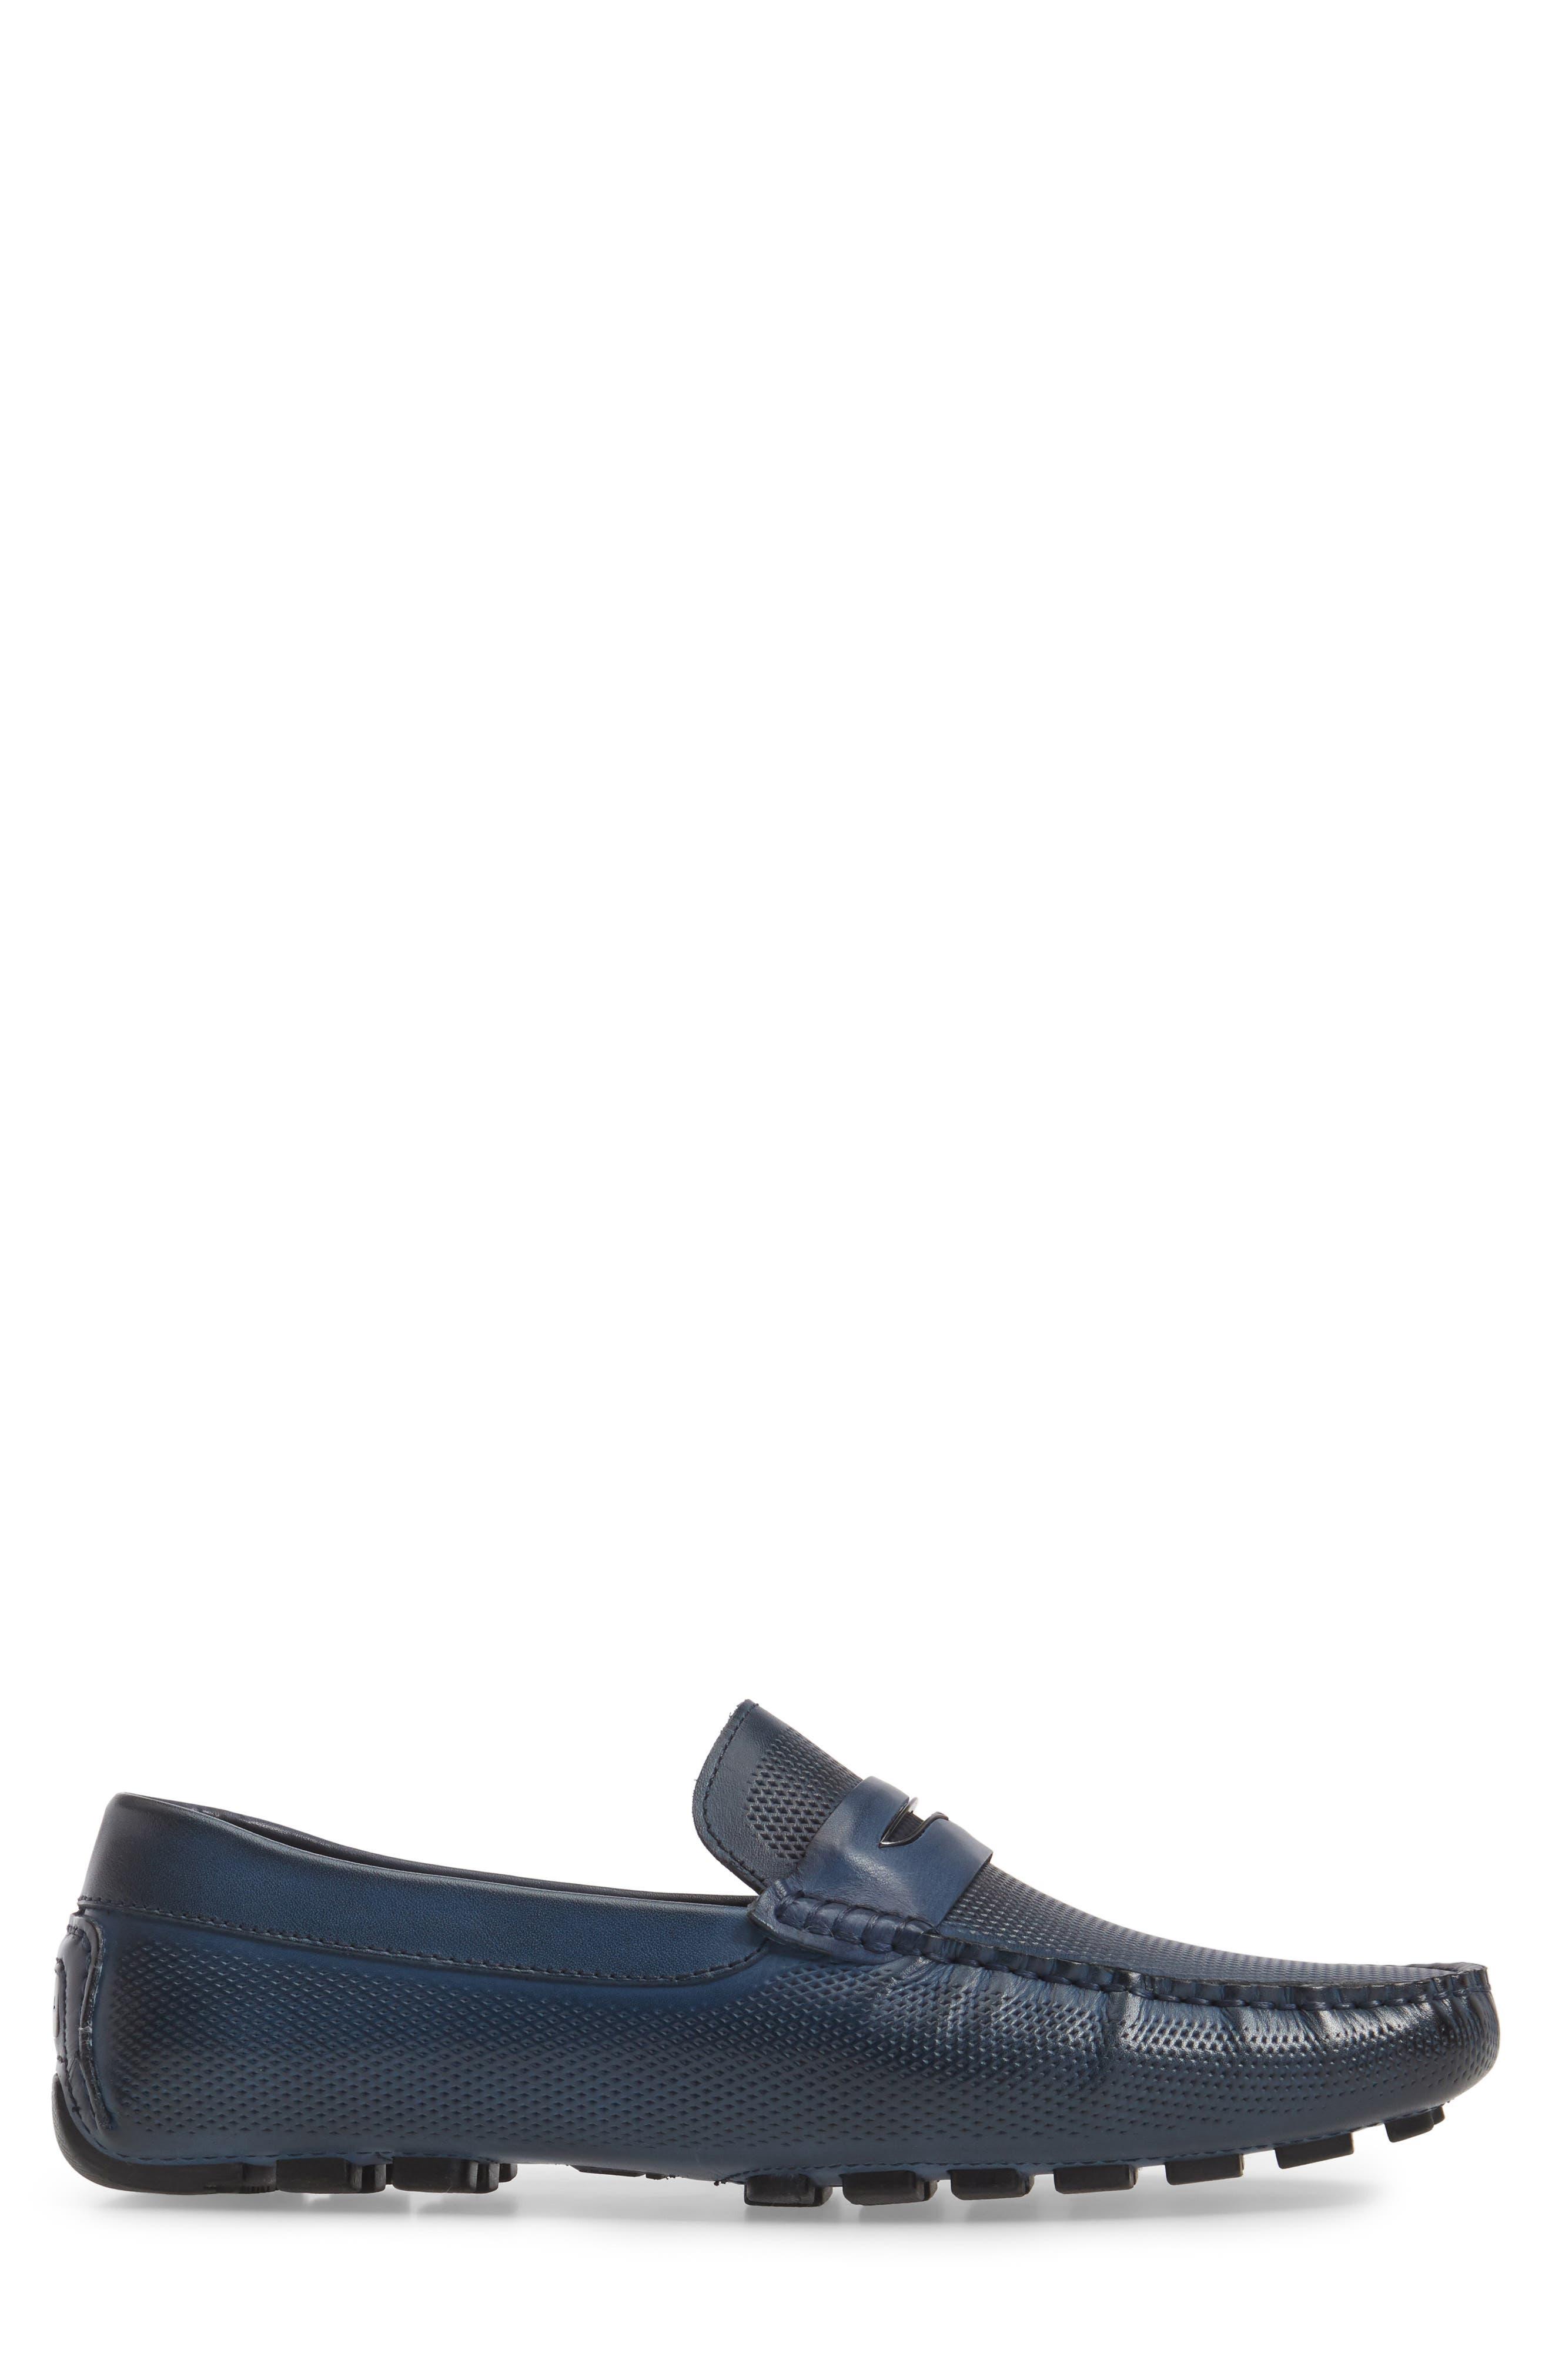 Mondrian Driving Shoe,                             Alternate thumbnail 3, color,                             Blue Leather